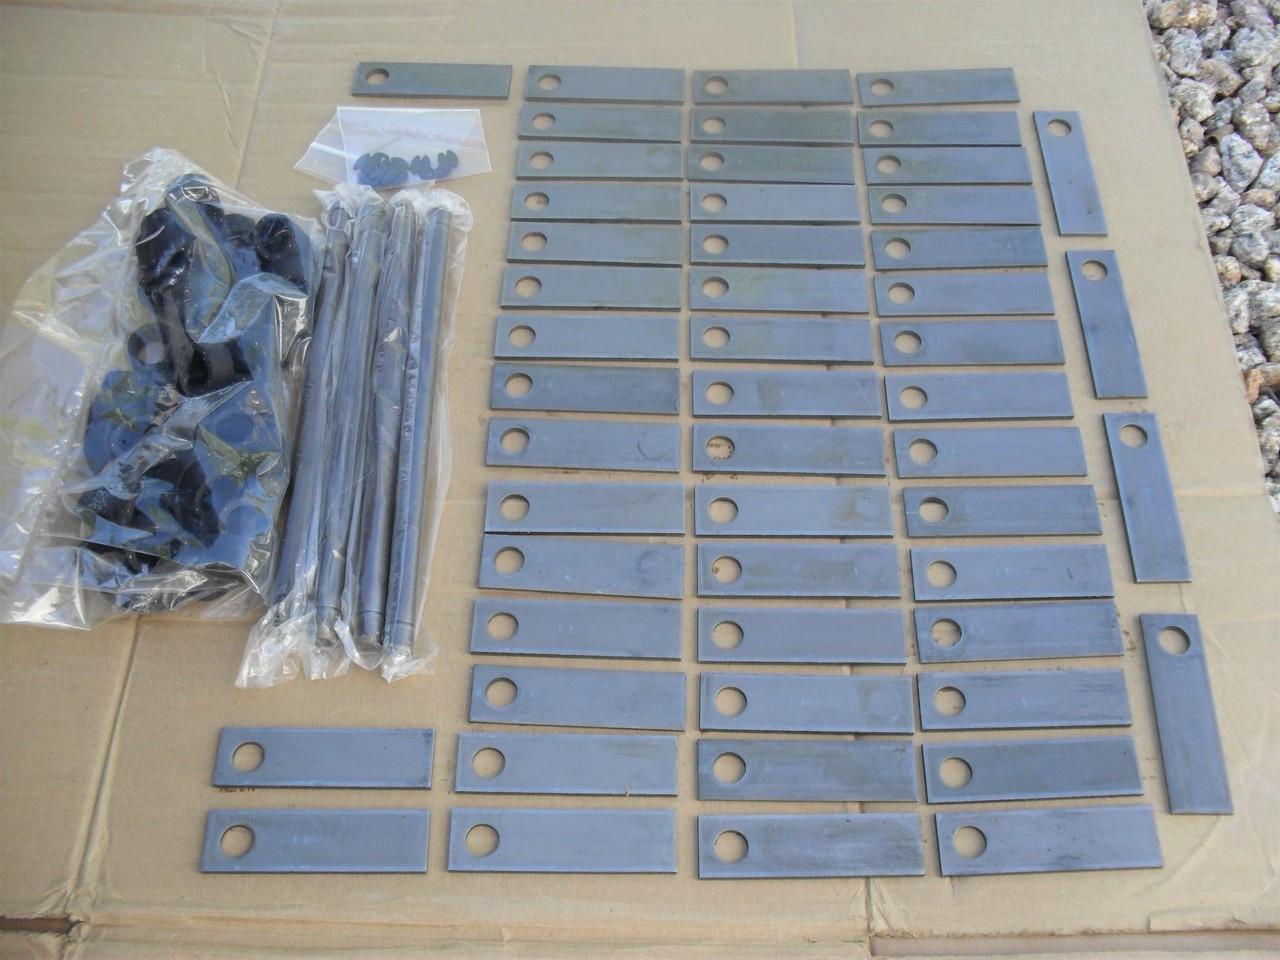 "Thatcher Rebuild Kit for BlueBird F20B and C18, 5201, 5002, 5004 Teeth Blades 3-1/2"", Bushings, Shafts with Clips dethatcher, aerator, blue bird"